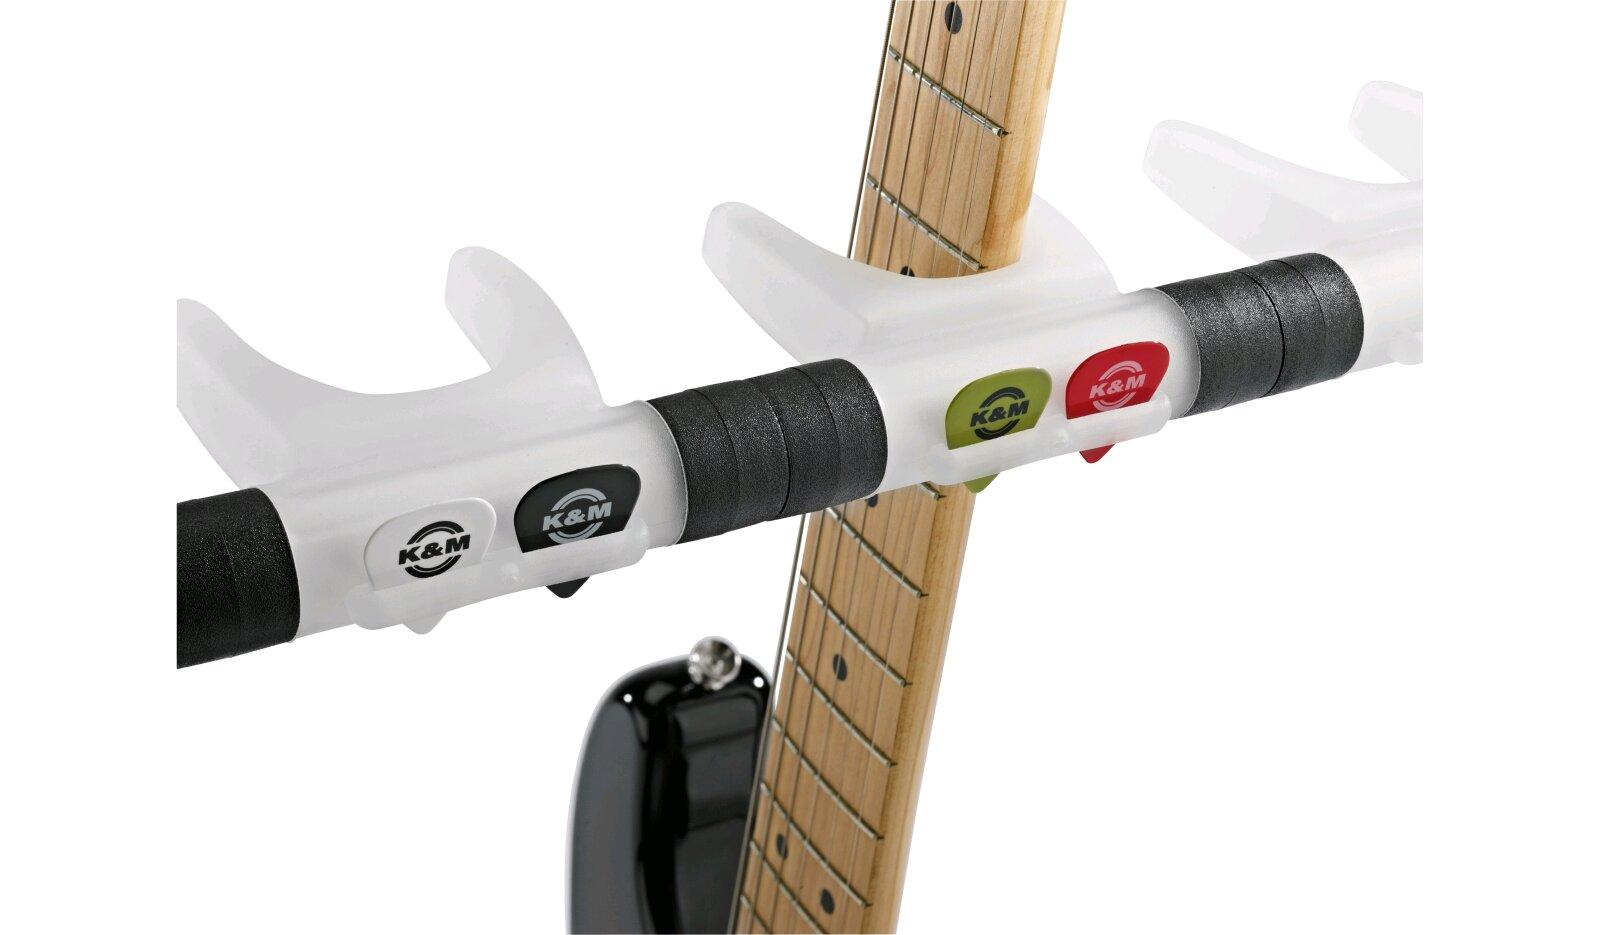 K & M 17525 – e-guitar stand Guardian 5 – Translucide : photo 4